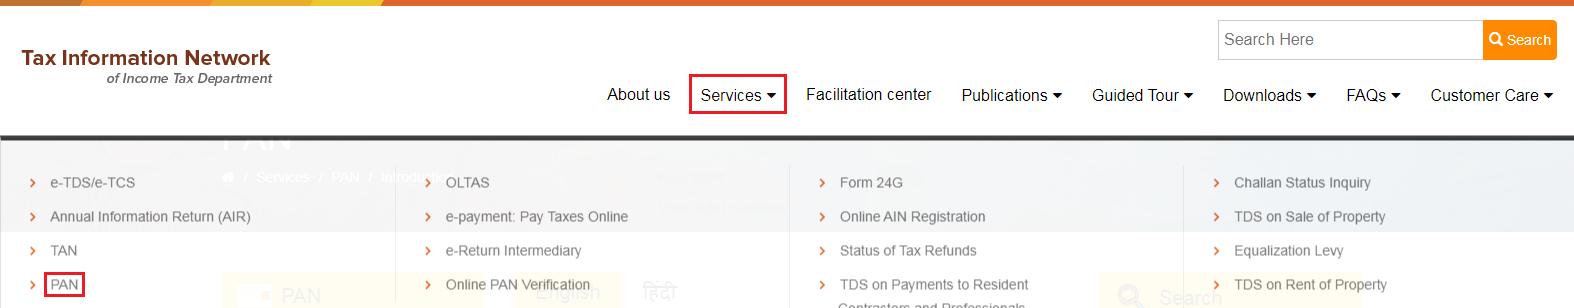 TIN-NSDL - PAN Services